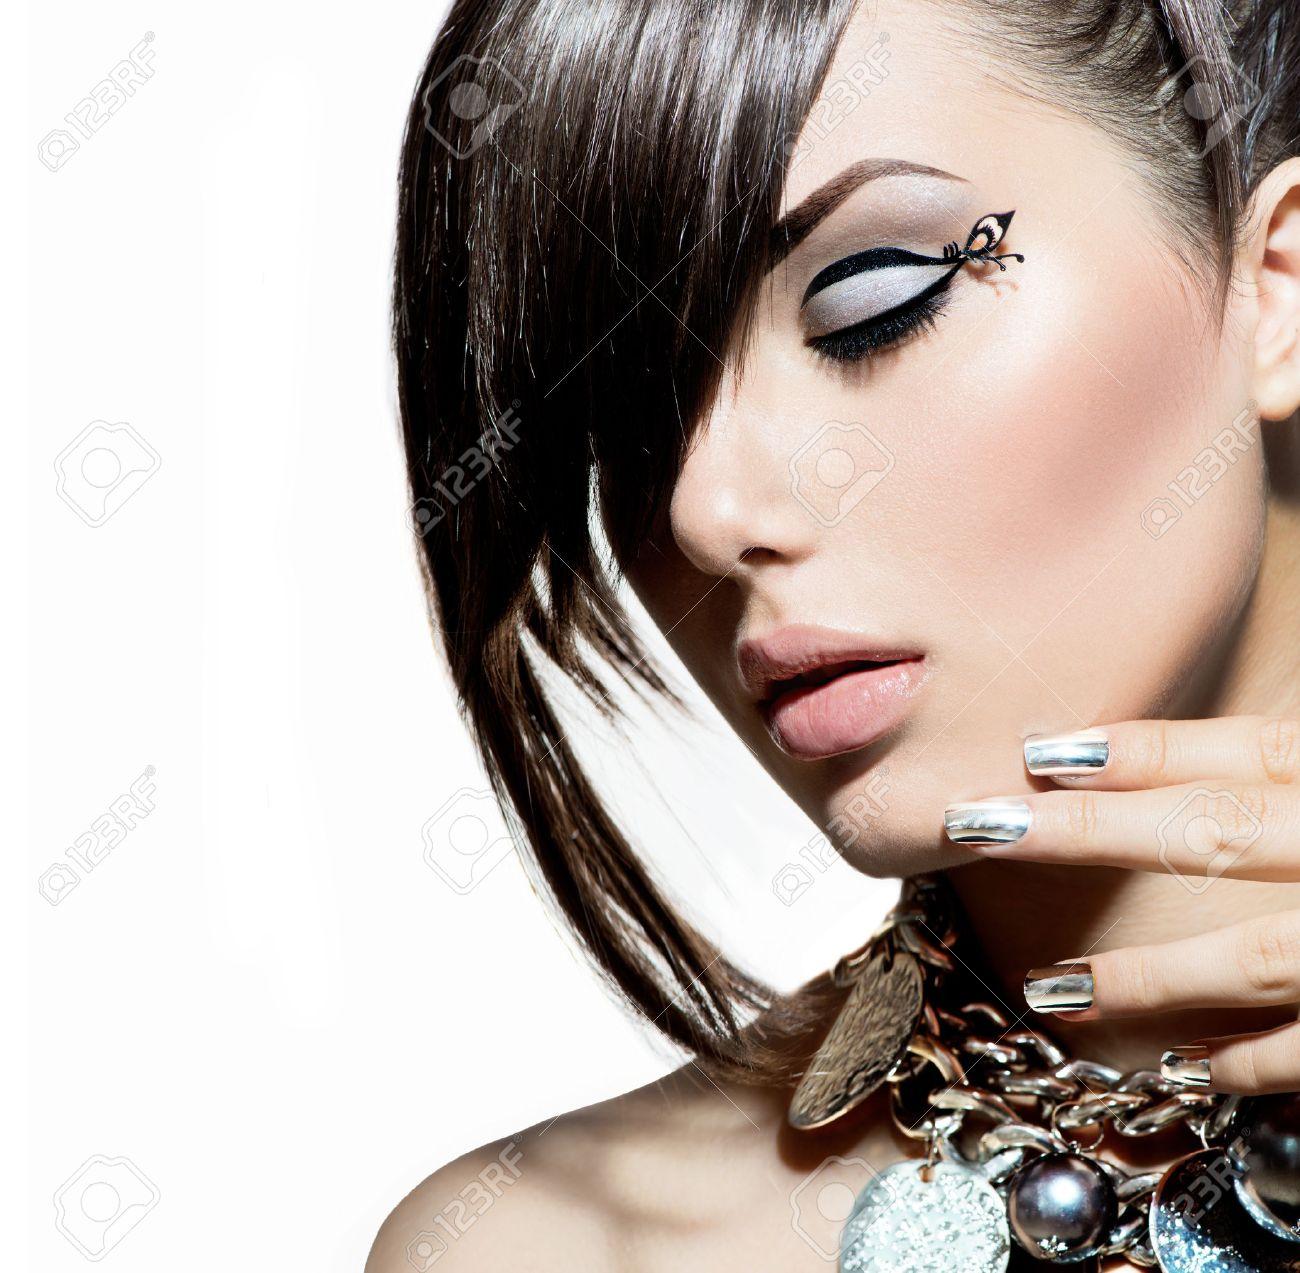 Fashion Model Girl Portrait  Trendy Hair Style Stock Photo - 25215143